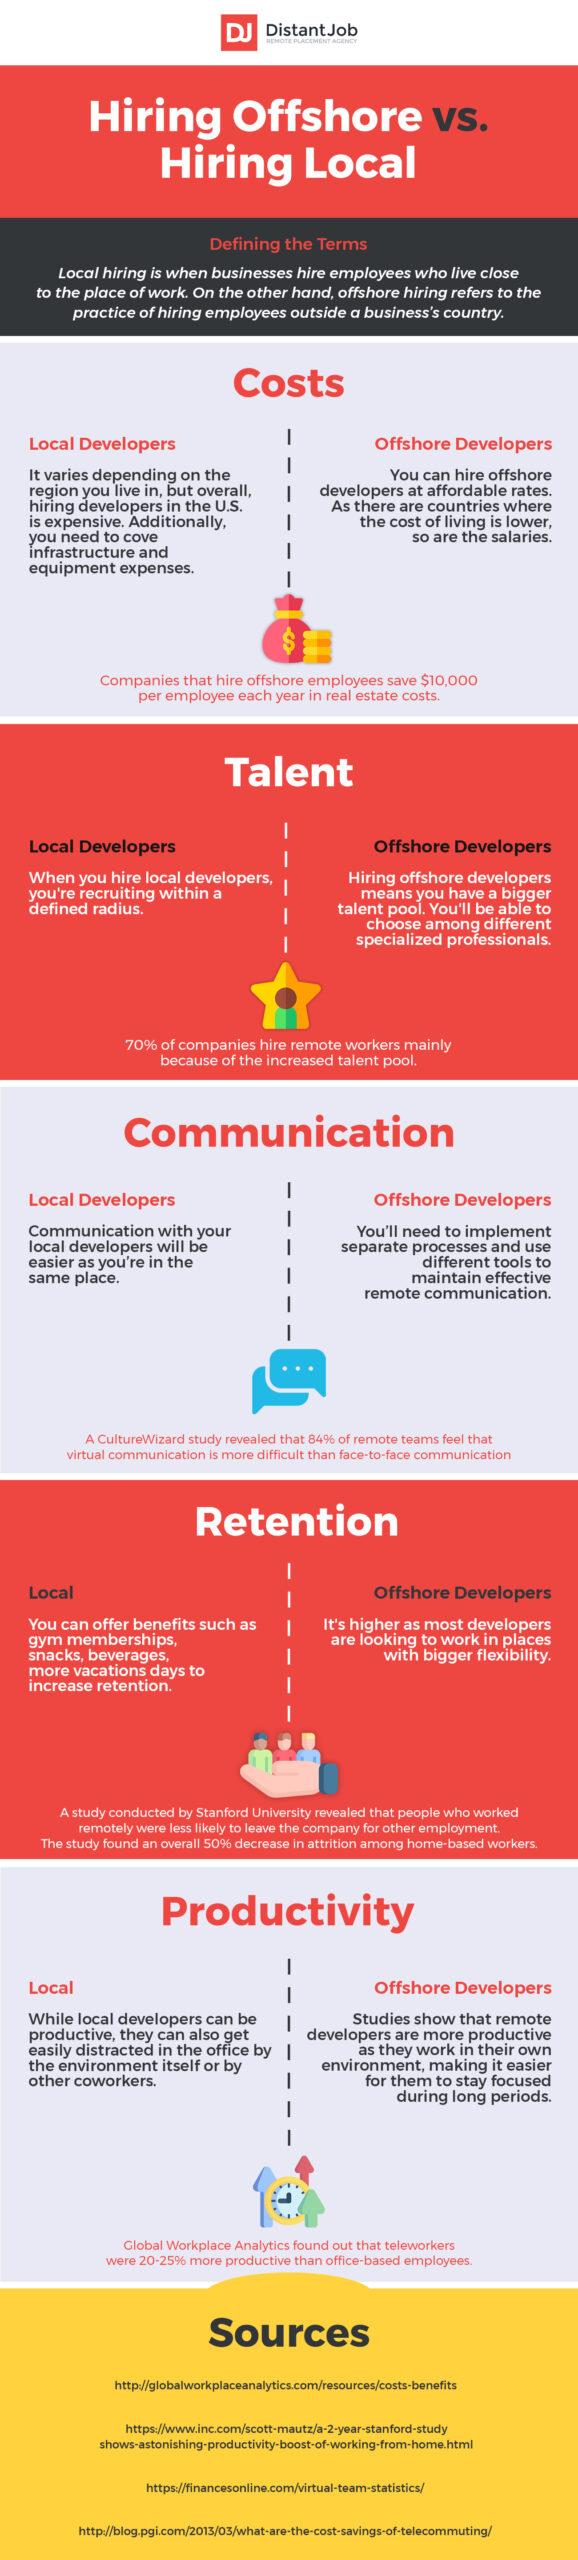 Hiring offshore vs hiring local developers